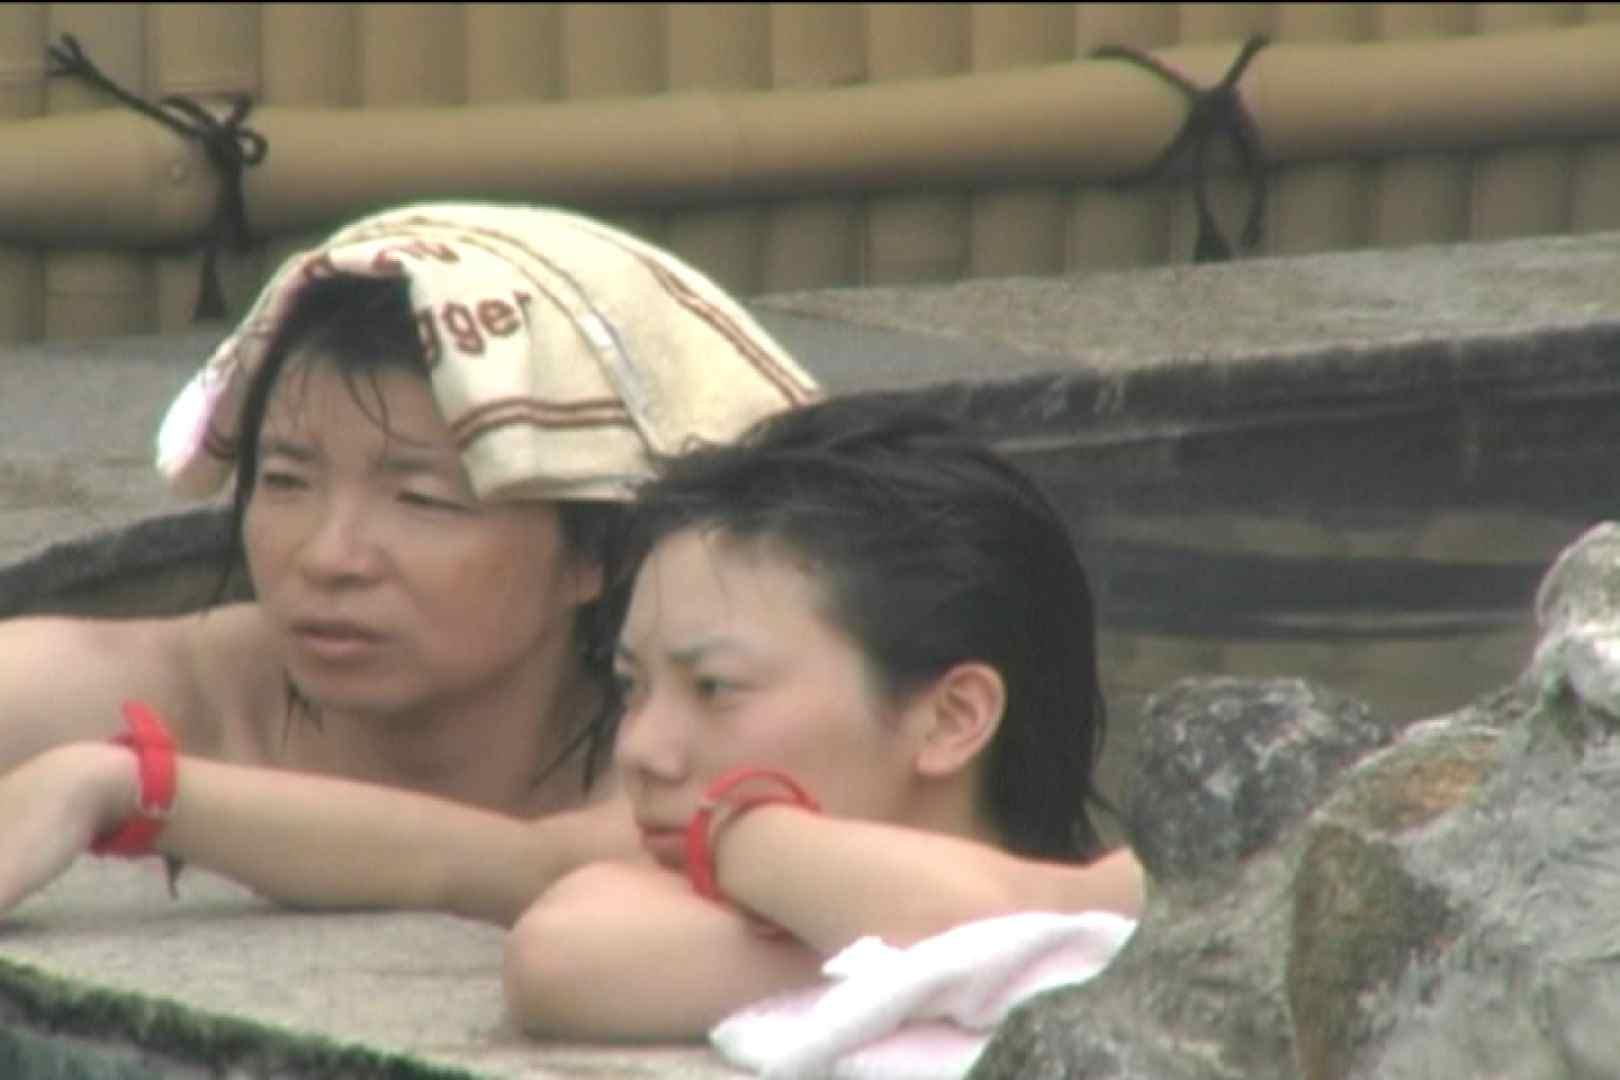 Aquaな露天風呂Vol.122 露天 | OL女体  77連発 4